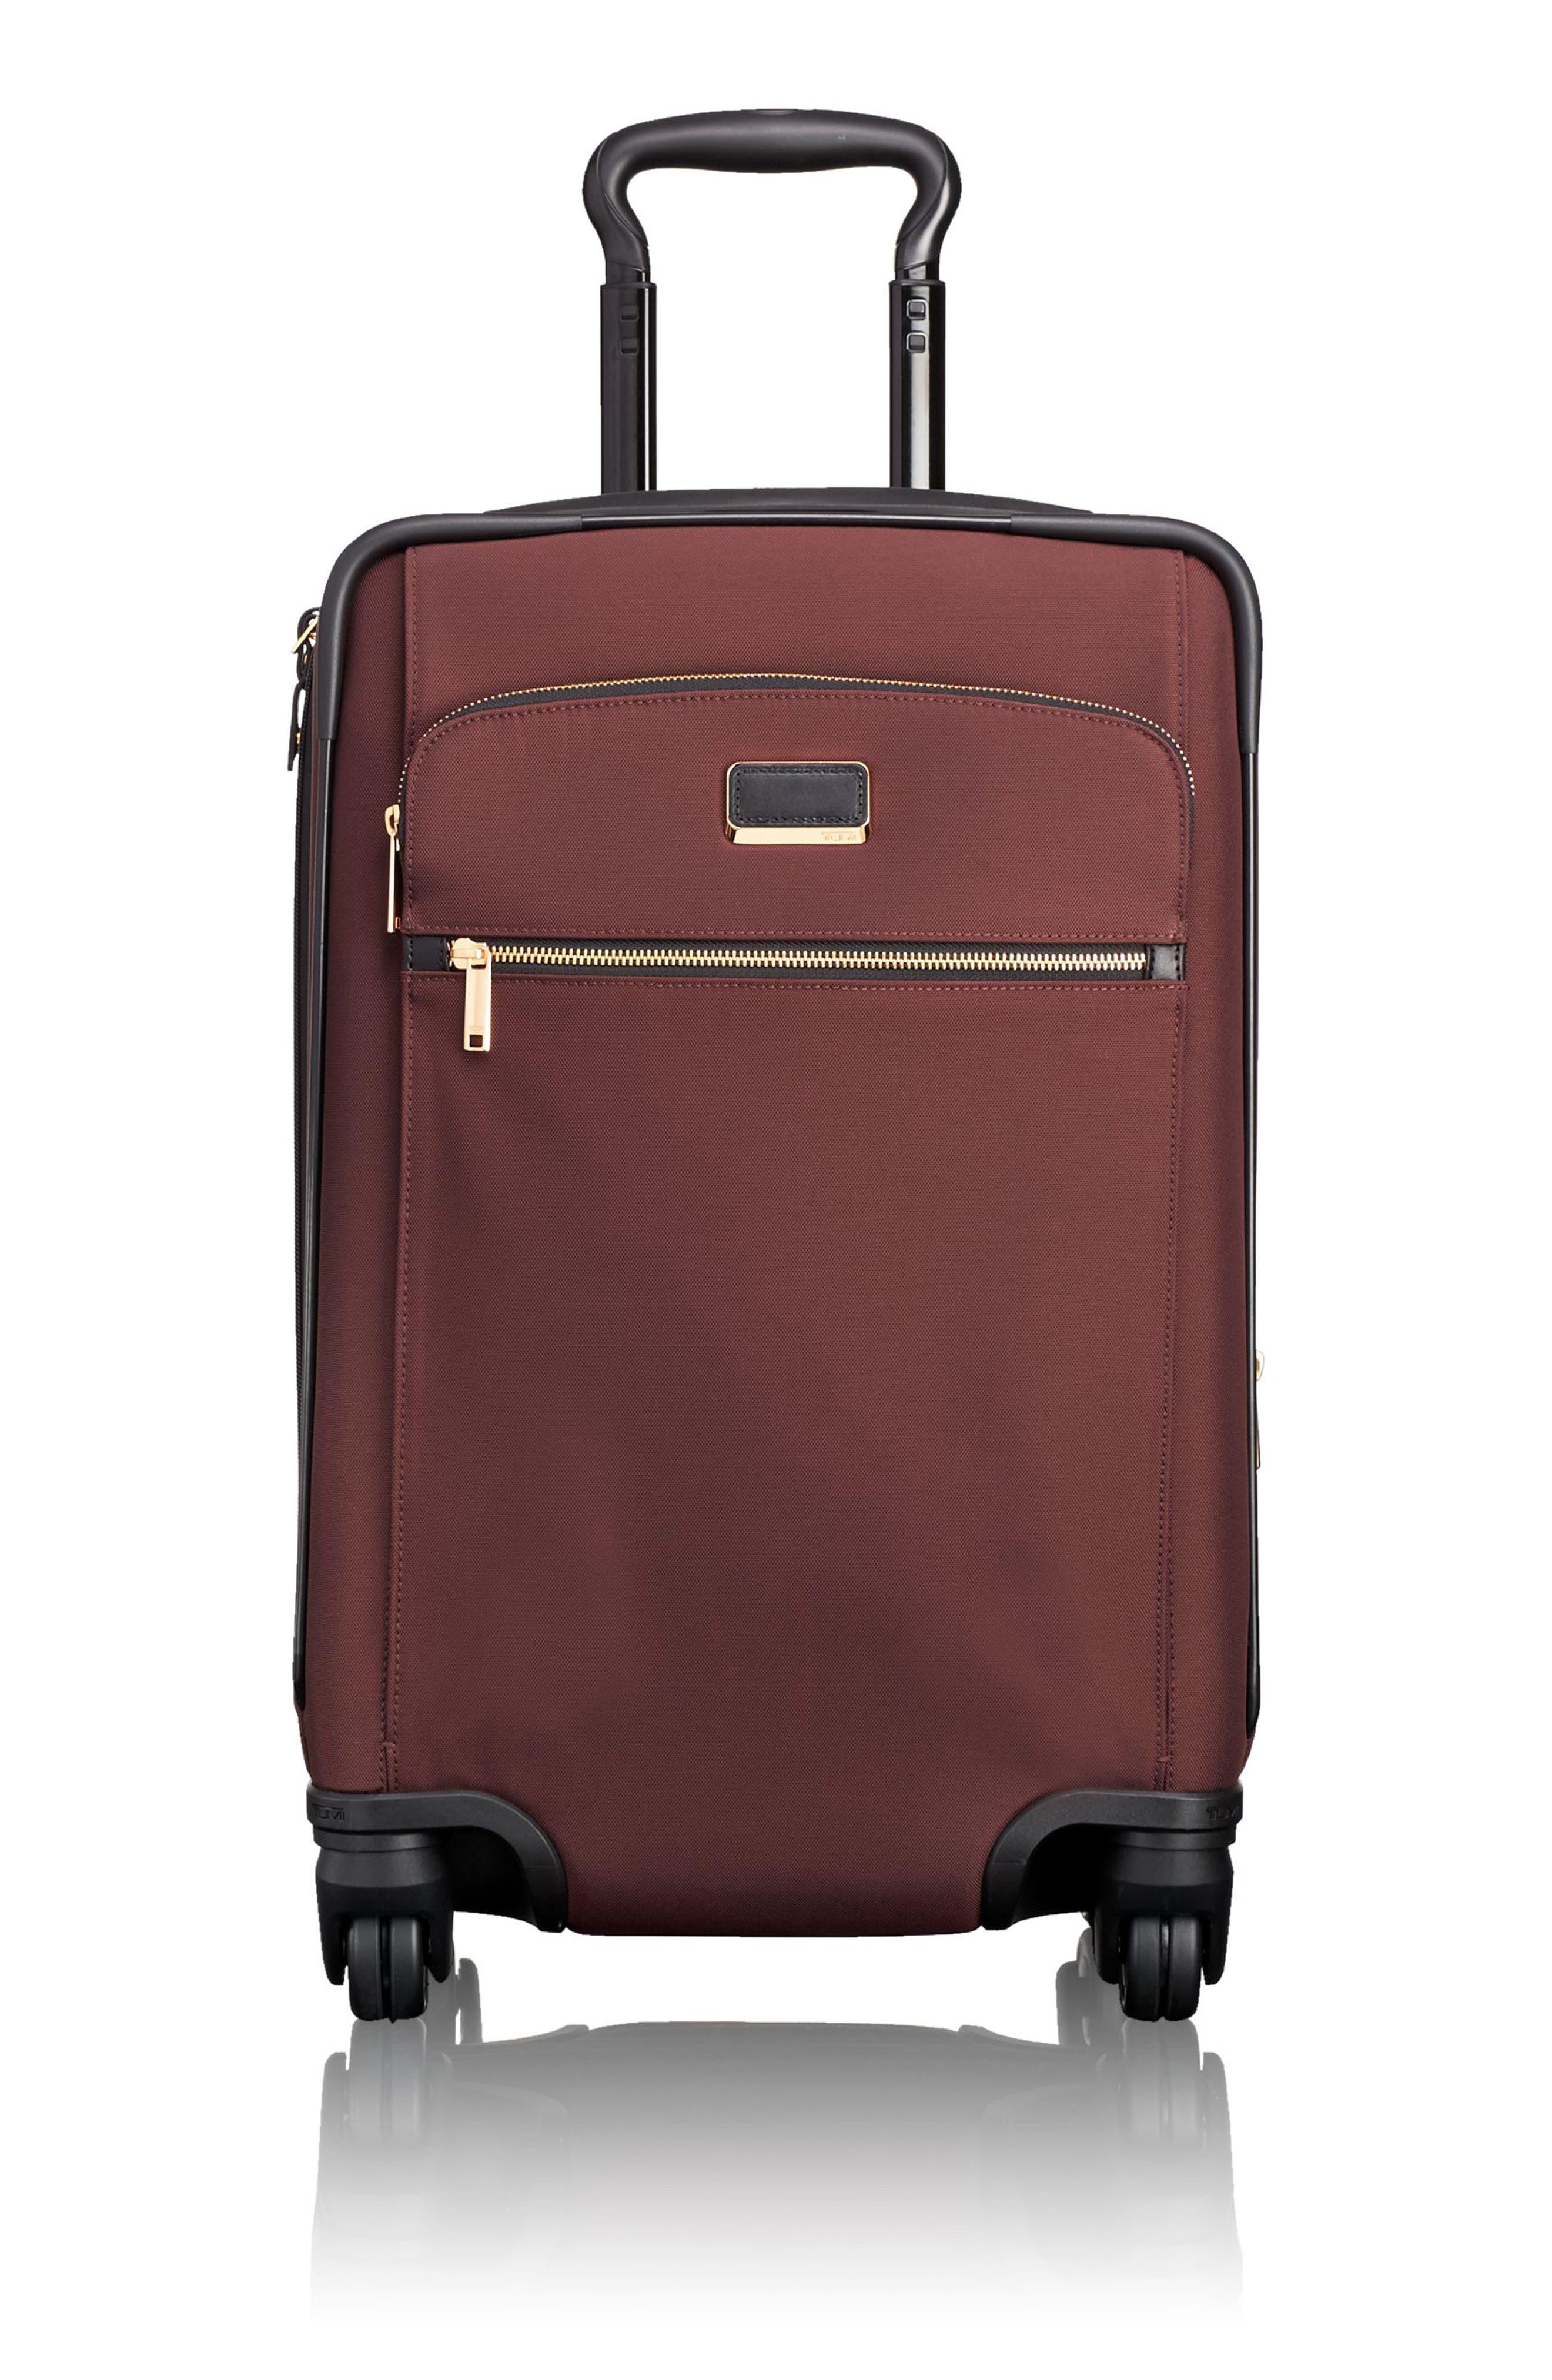 TUMI Sam International Expandable 22-Inch 4-Wheel Carry-On